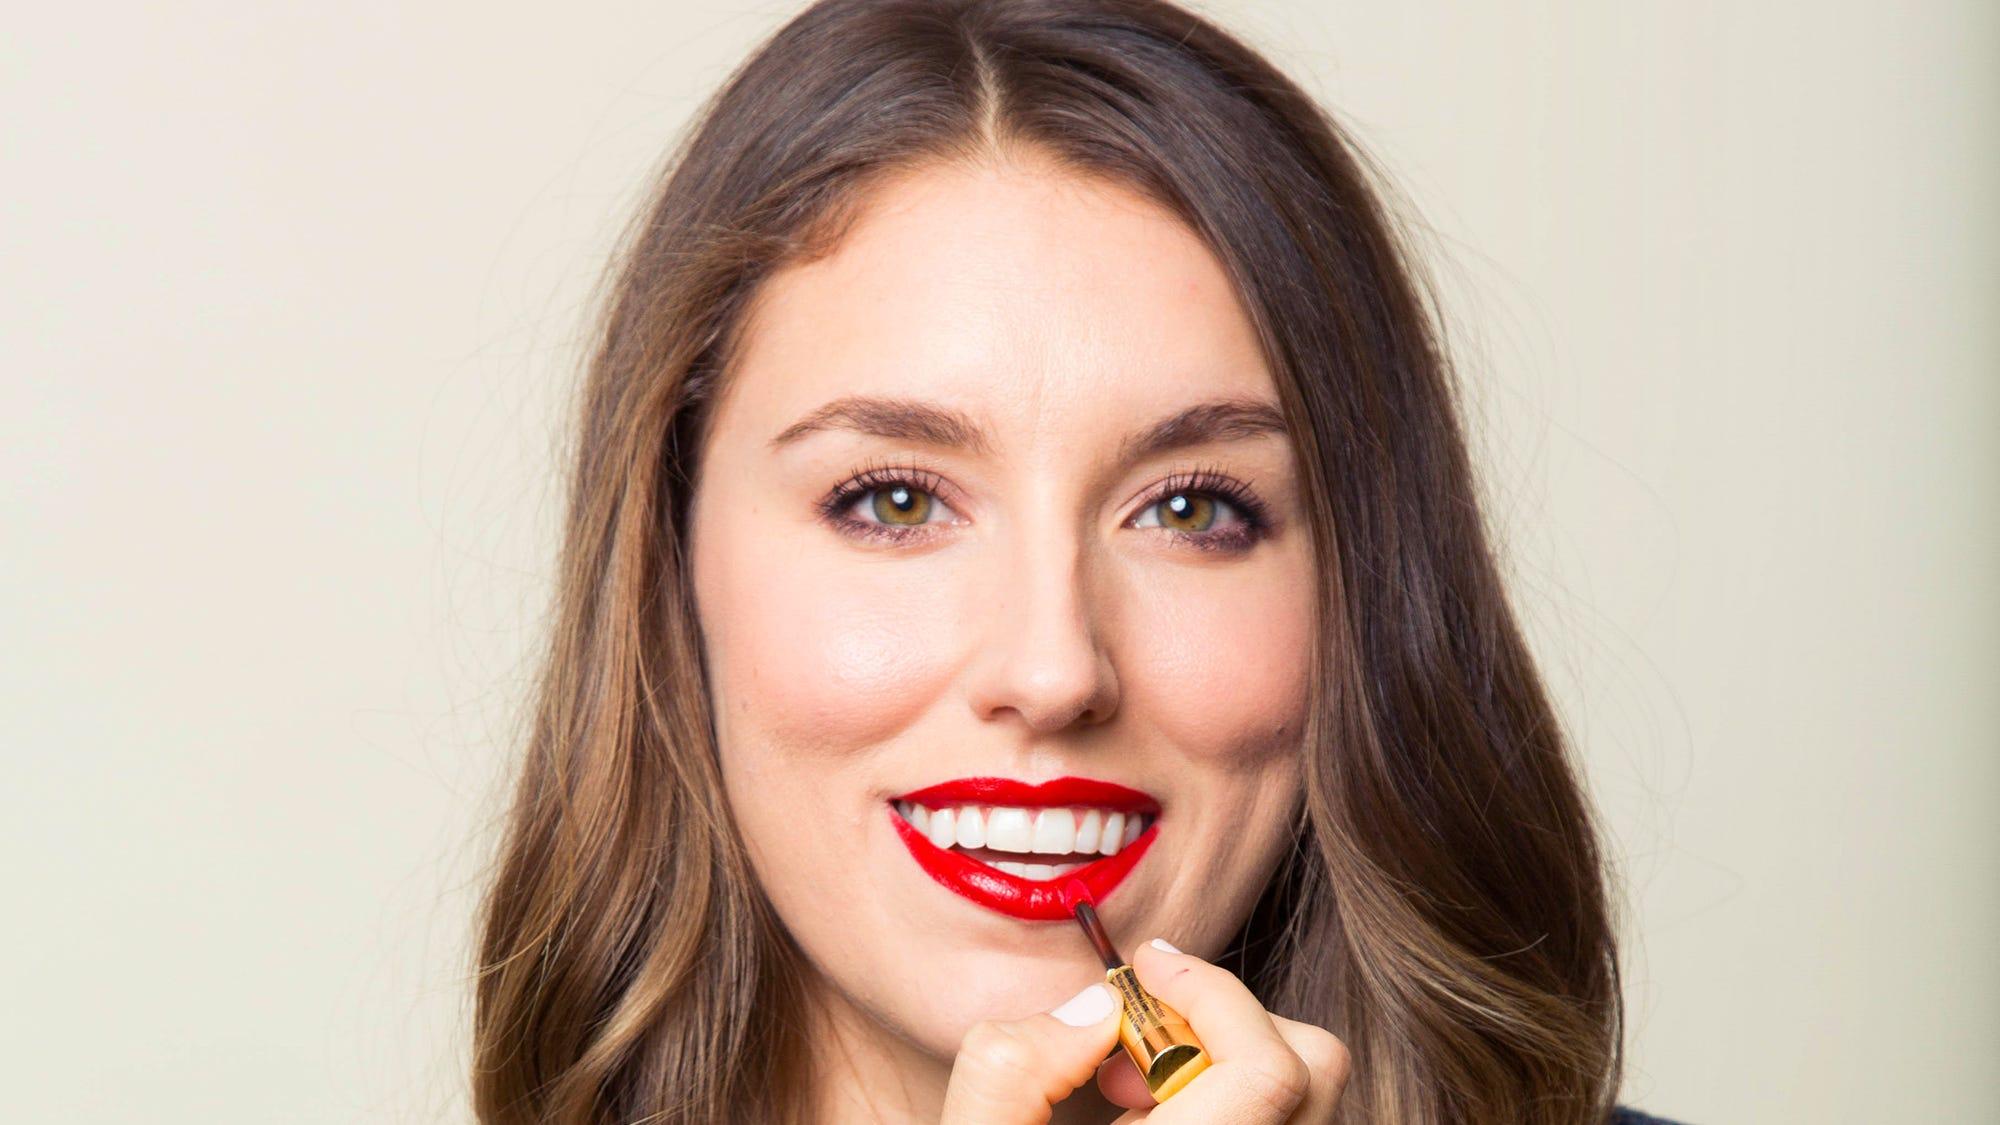 Lipsense New Long Lasting Waterproof Lipstick Review Eighty Eight Holiday Lip Pencil Set